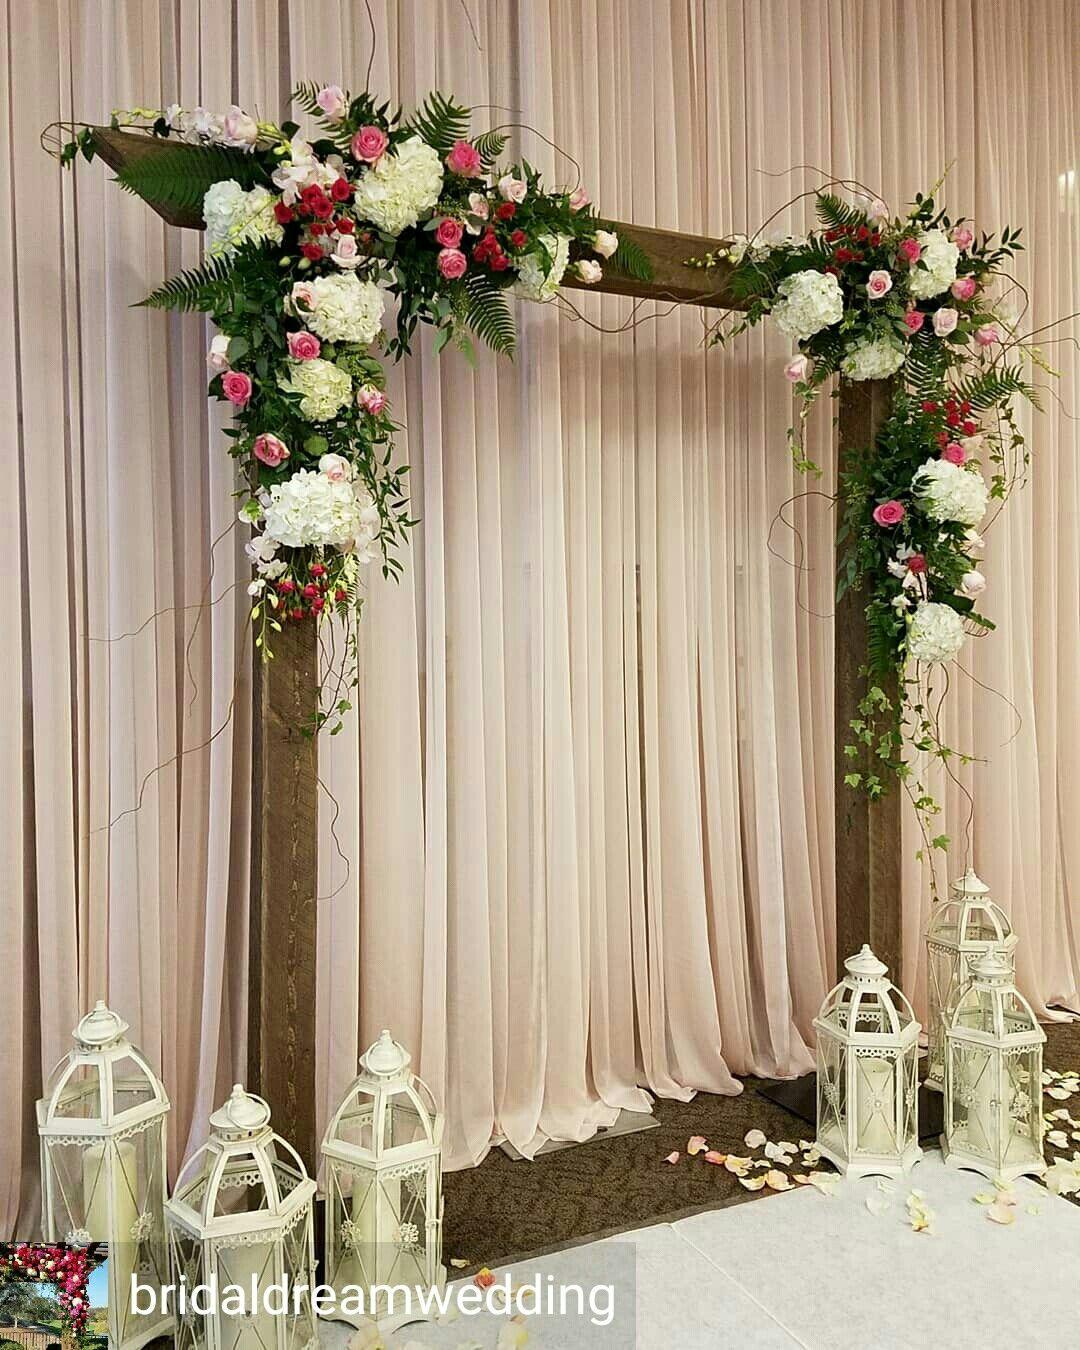 Dance Ideas Photo Booth Backdrop Wedding Wedding Reception